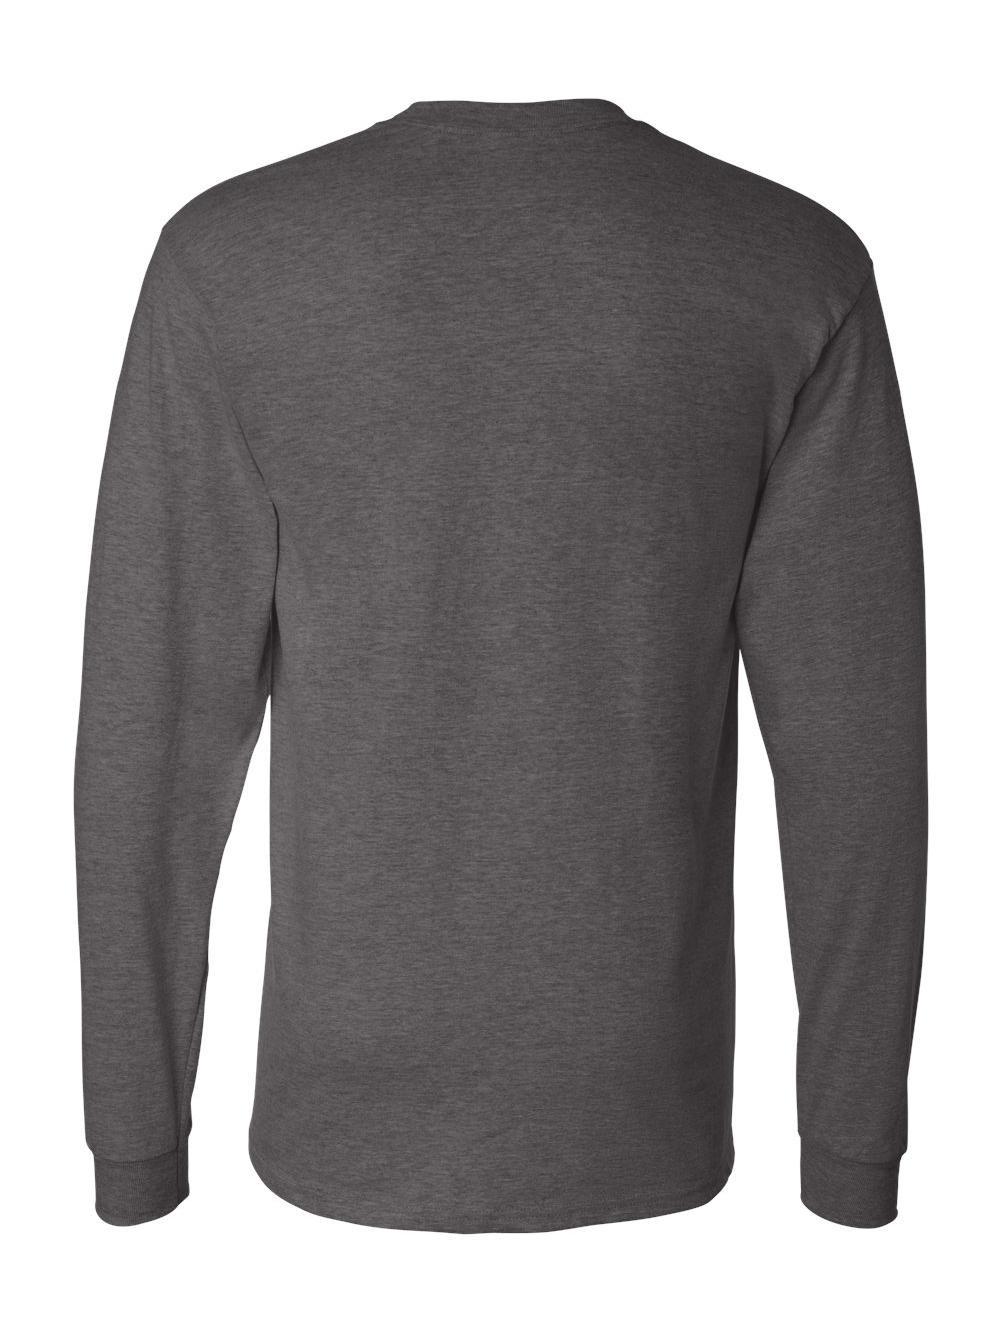 Hanes-Beefy-T-Long-Sleeve-T-Shirt-5186 thumbnail 16